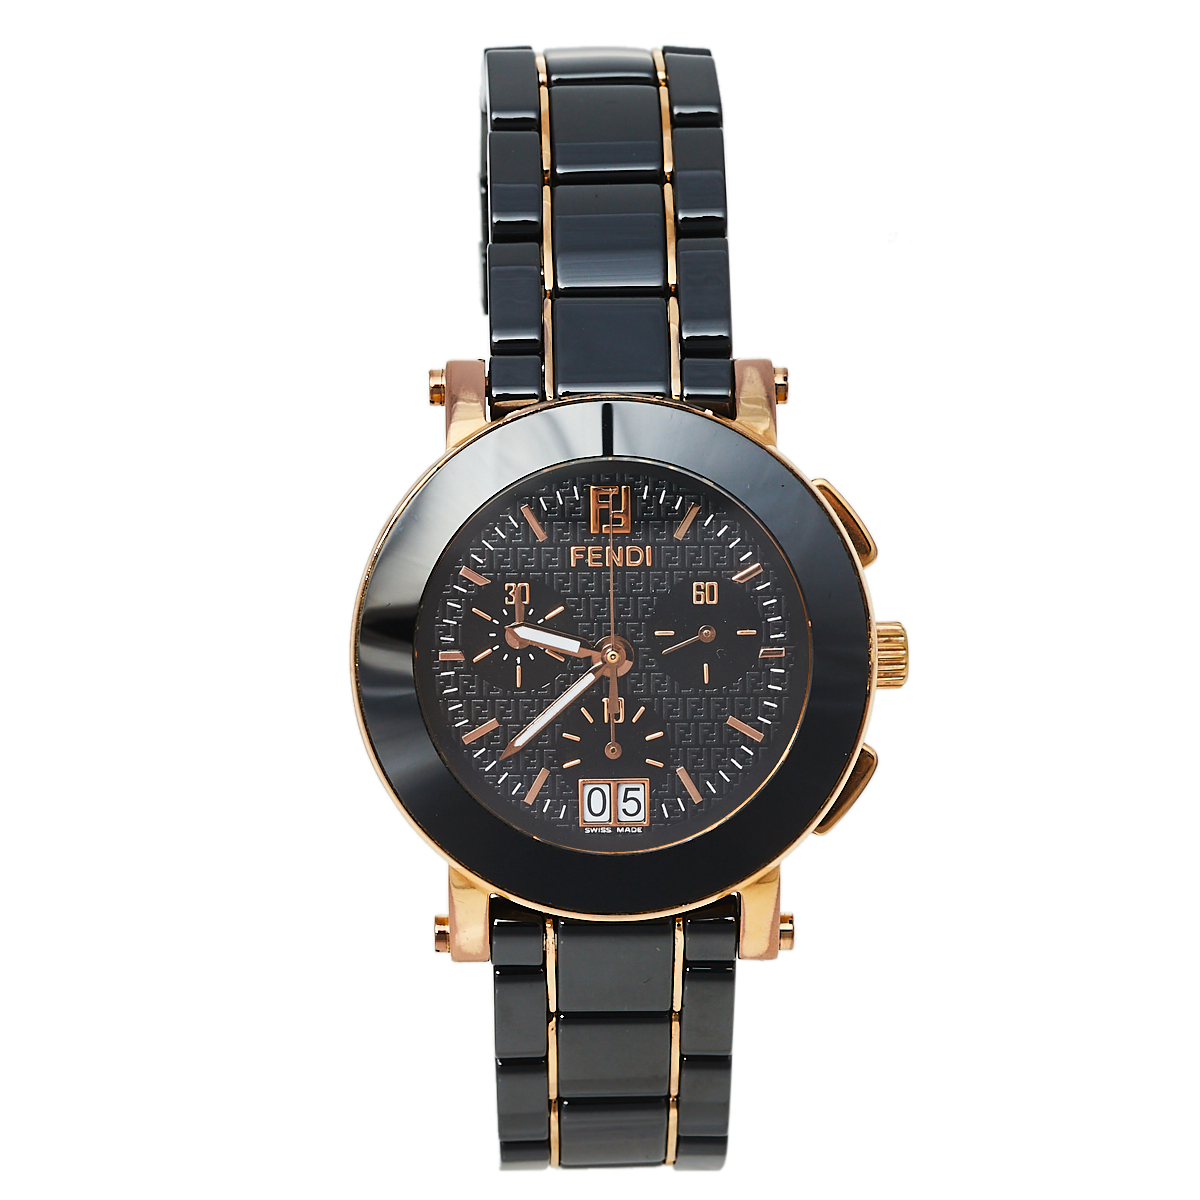 Pre-owned Fendi Black Ceramic & Gold Tone Stainless Steel Chrono 6700g Women's Wristwatch 38 Mm